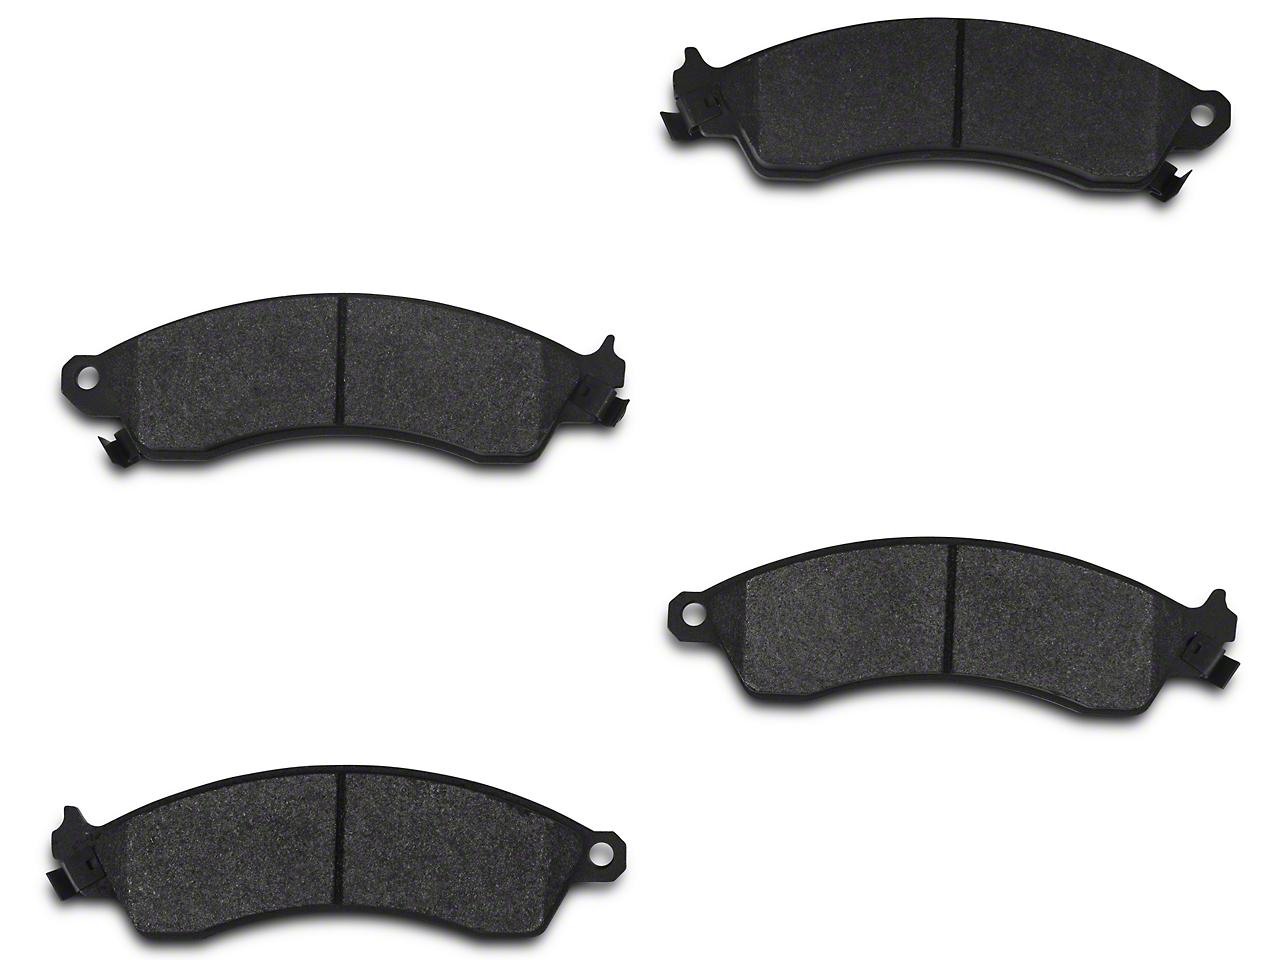 Xtreme Stop Carbon Graphite Brake Pads - Front Pair (94-04 Bullitt, Mach 1, Cobra)